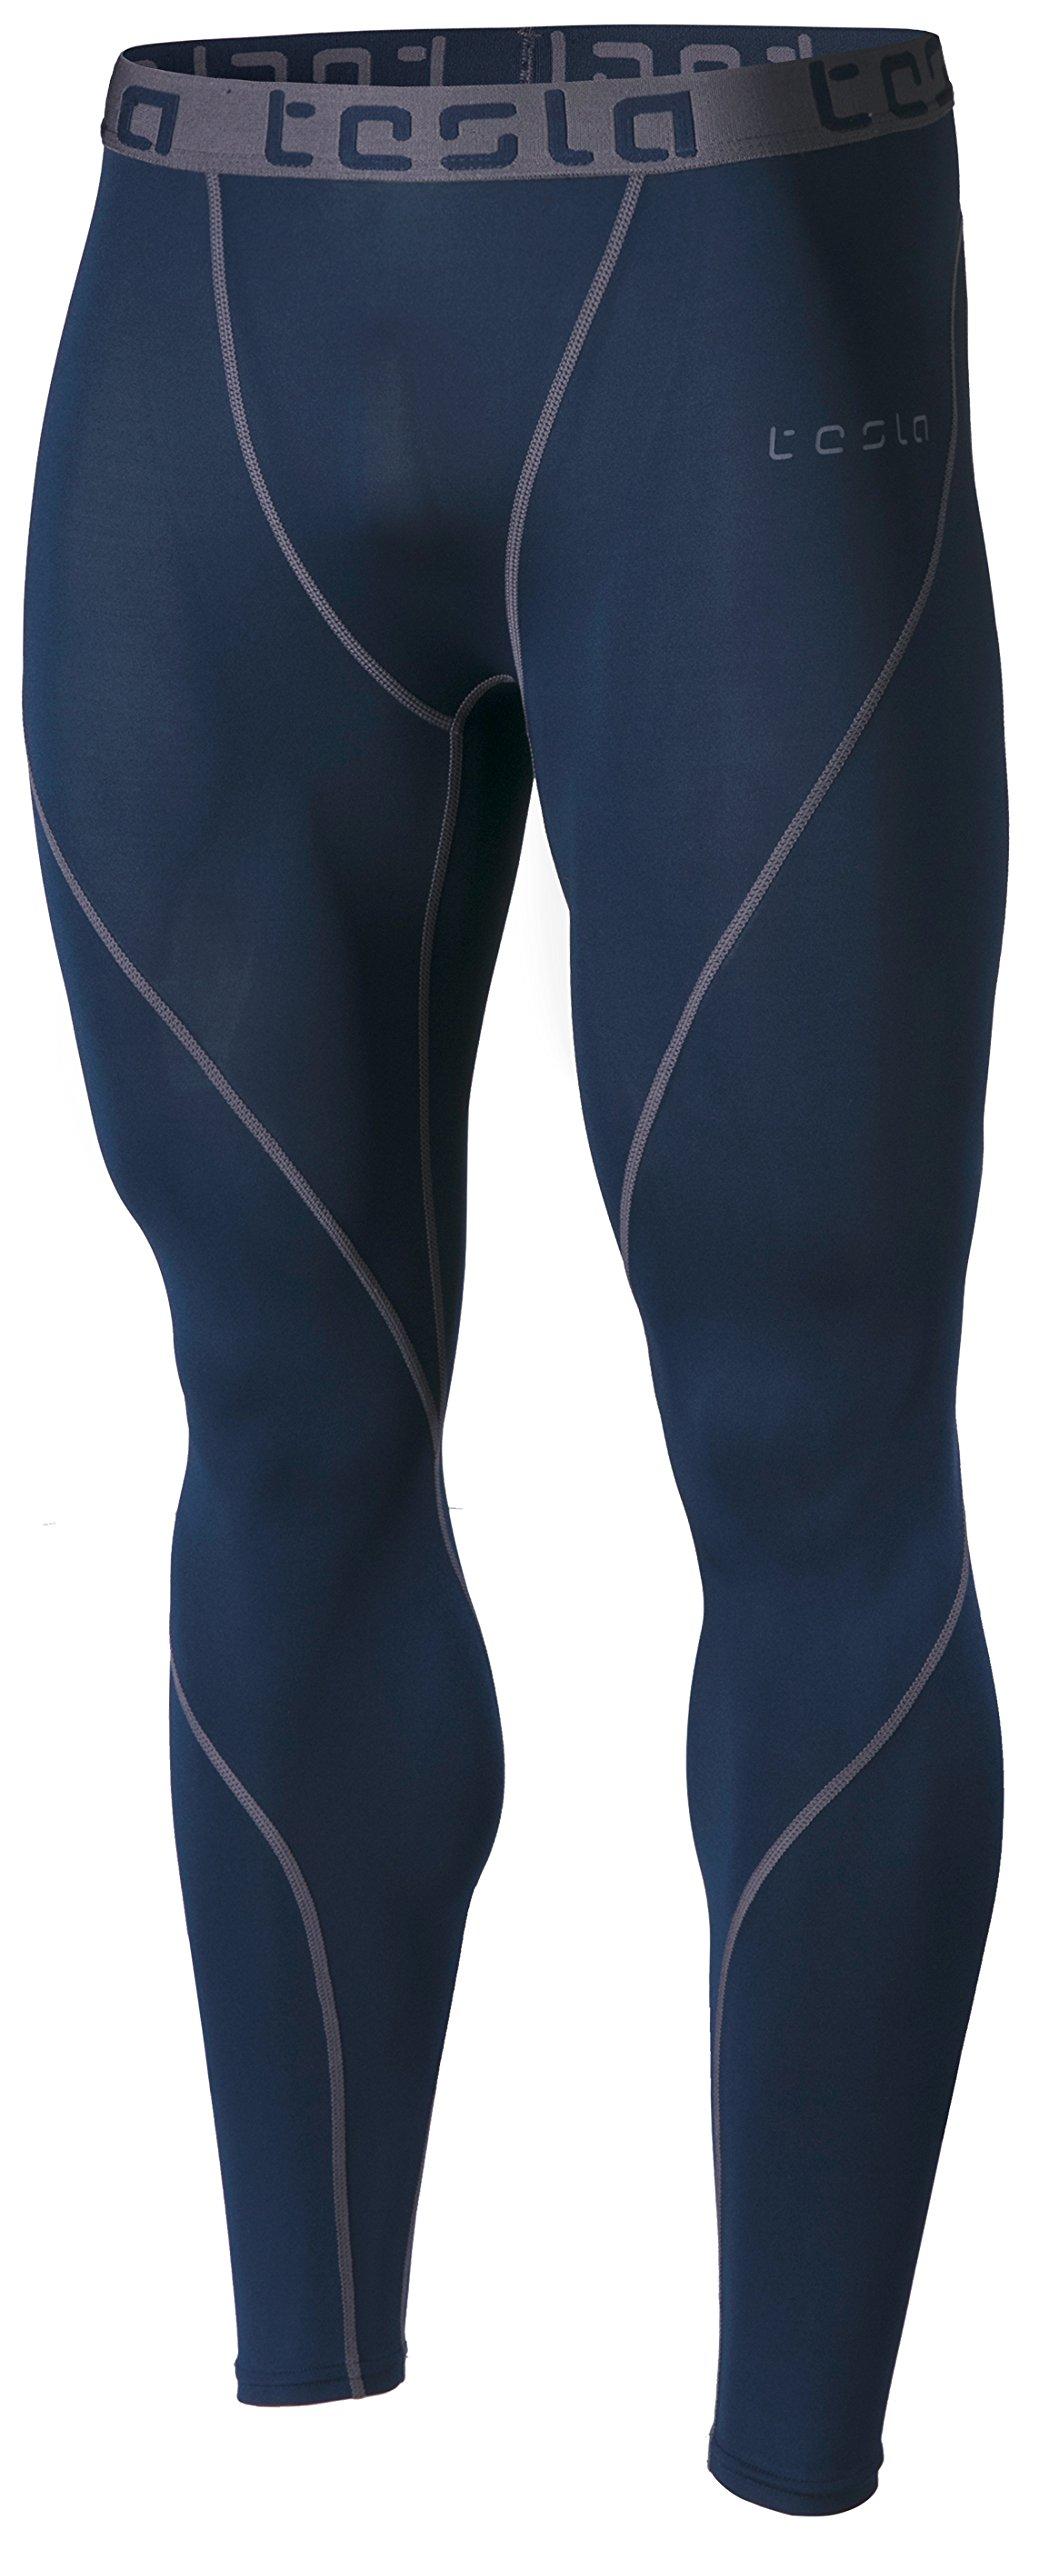 TSLA Men's Compression Pants Running Baselayer Cool